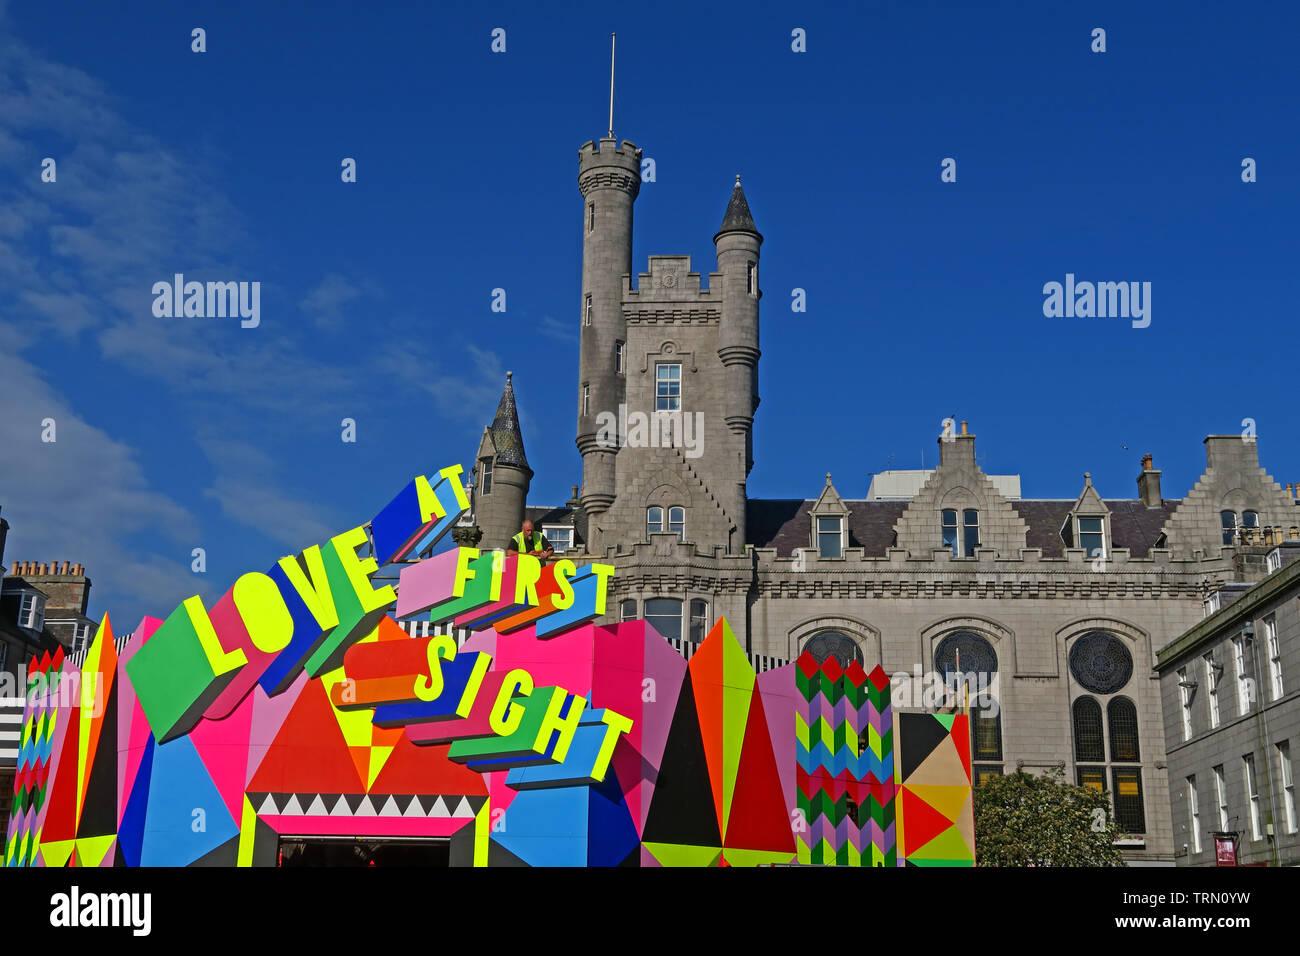 GoTonySmith,@HotpixUK,HotpixUK,North East,North East Scotland,Scottish,UK,City Centre,The Granite City,Northeast,Mercat,Aberdeen,Scotland,art,artist,installation,square,Art Festival 2019,art festival,artists,artworks,Look Again Festival,Castlegate